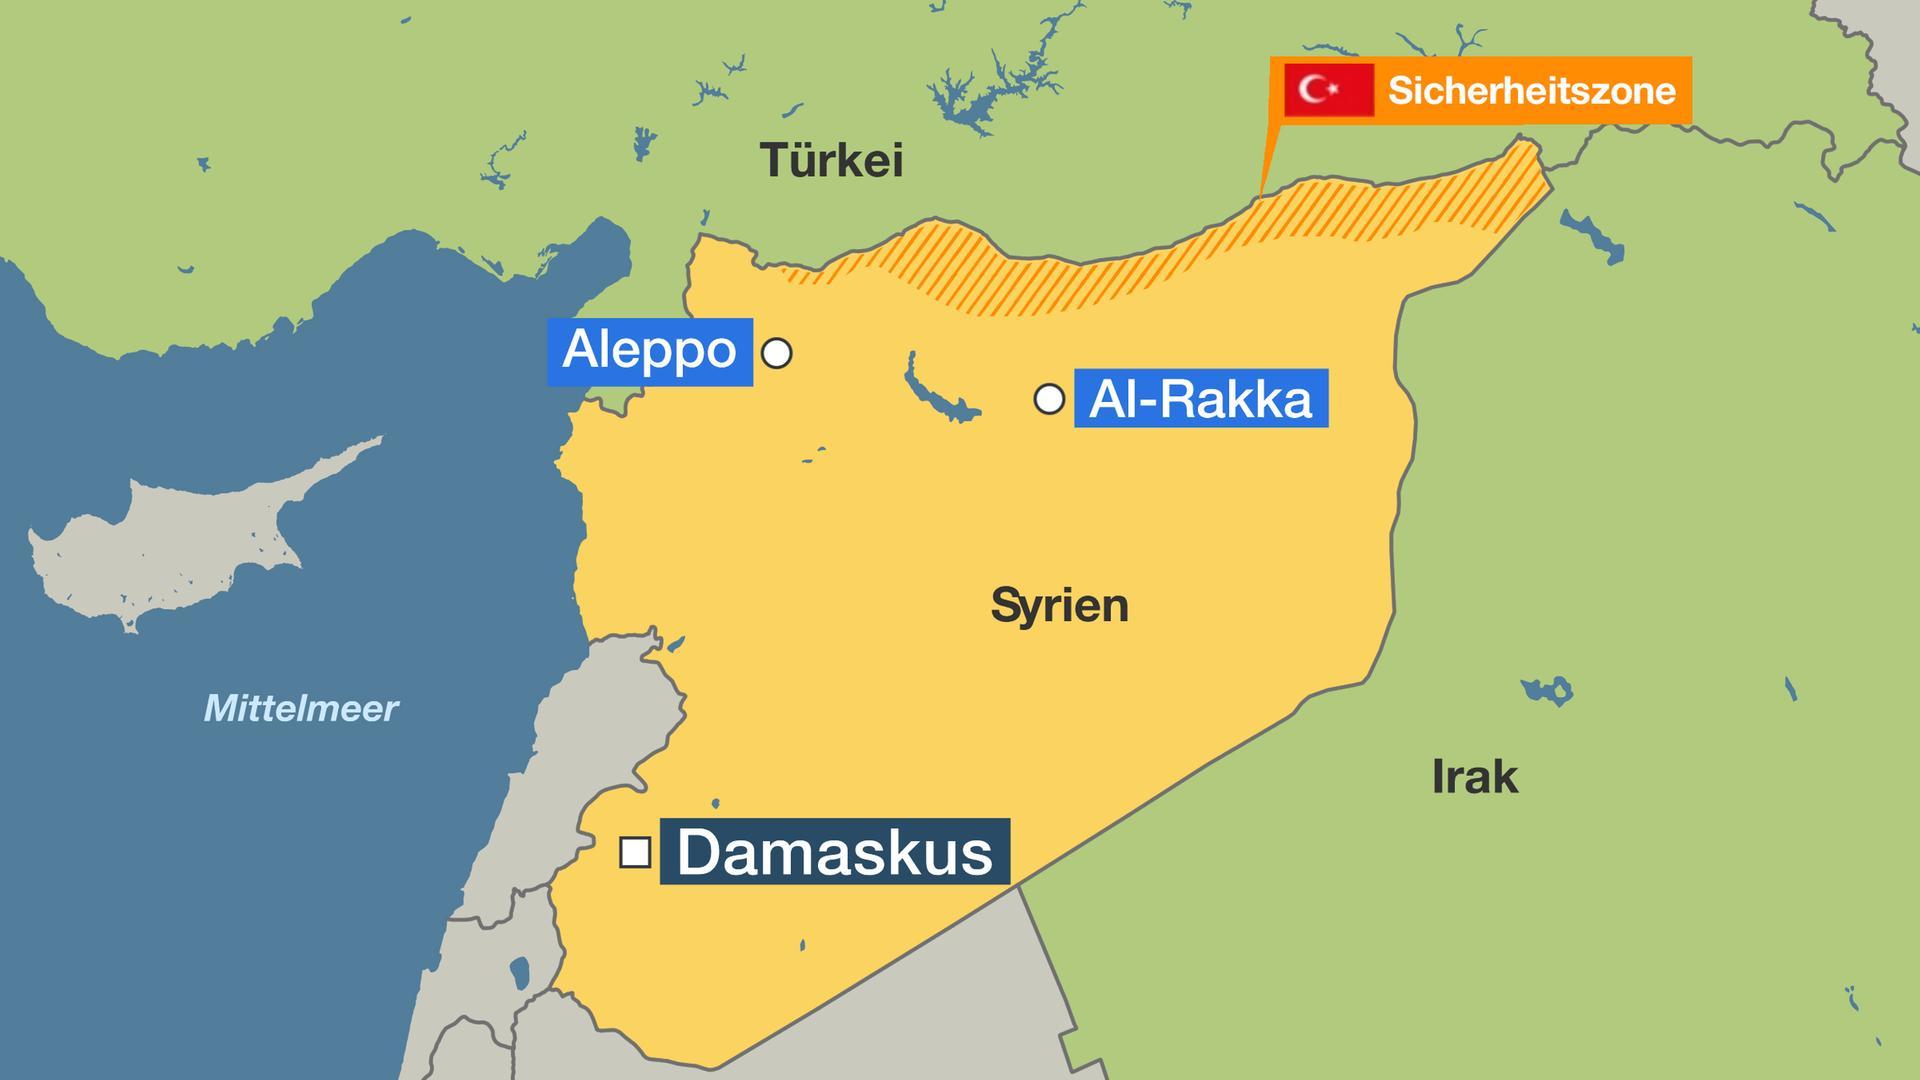 Syrien Irak Karte.Nordsyrien Turkei Beginnt Militaroffensive Zdfmediathek